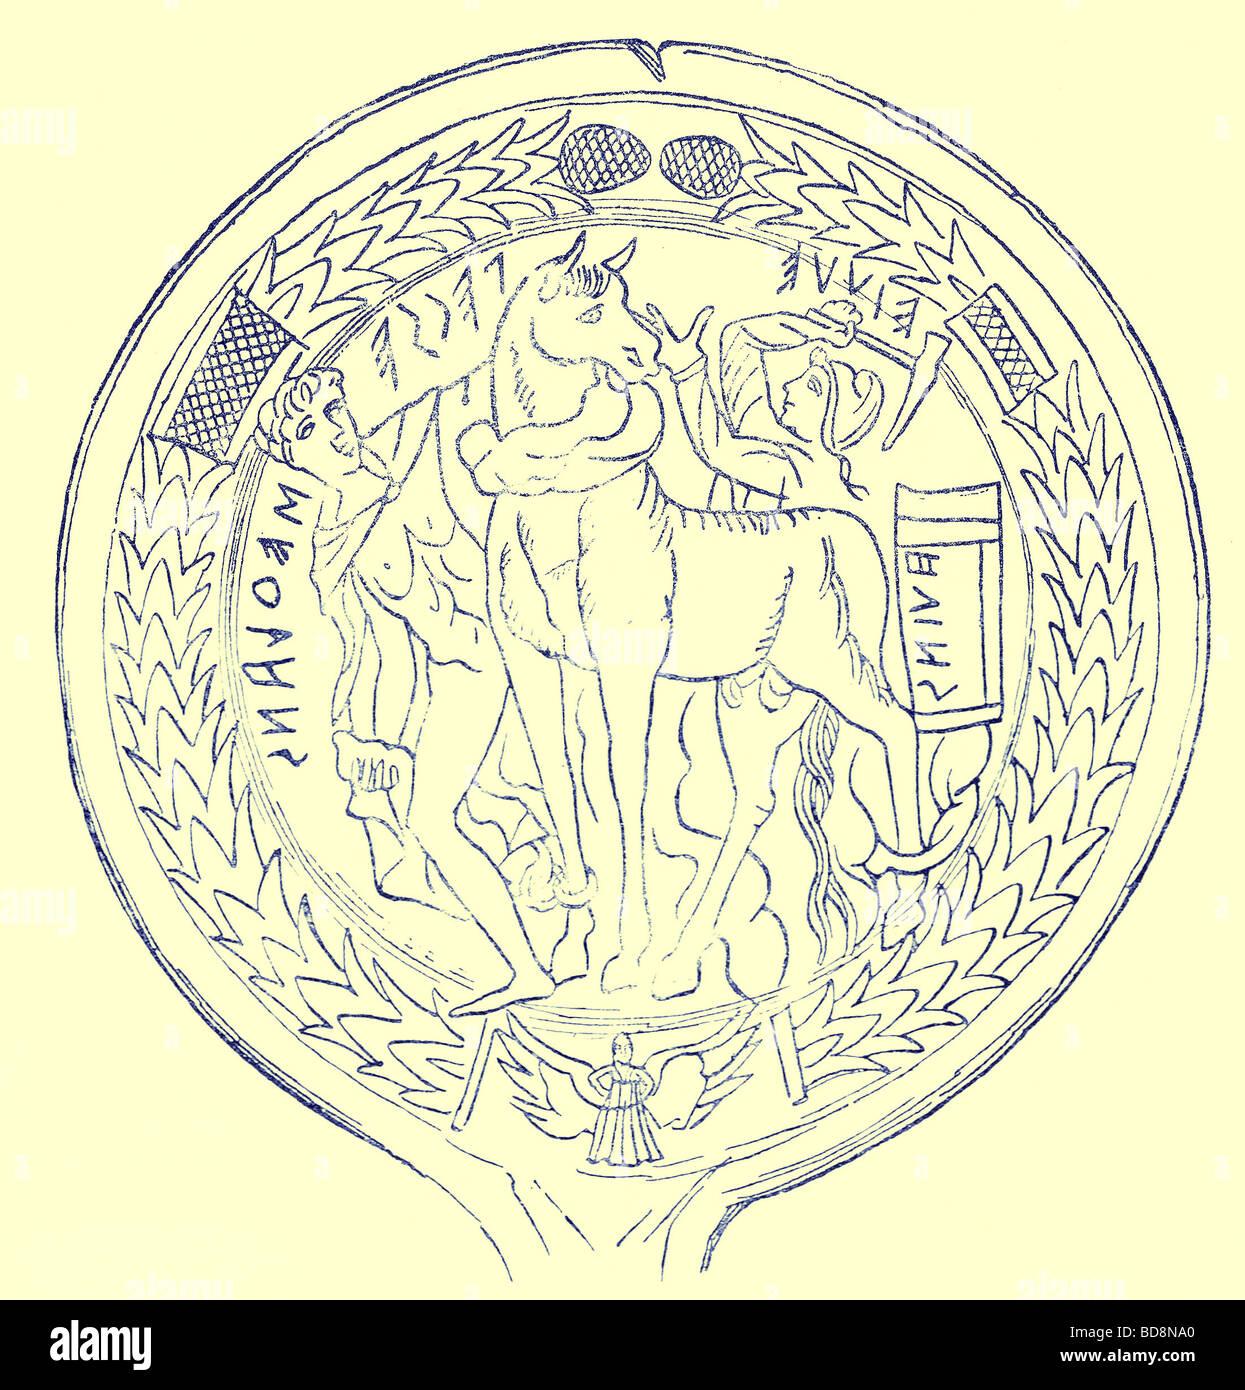 hephaistos and epeios constructing the trojan horse illustration